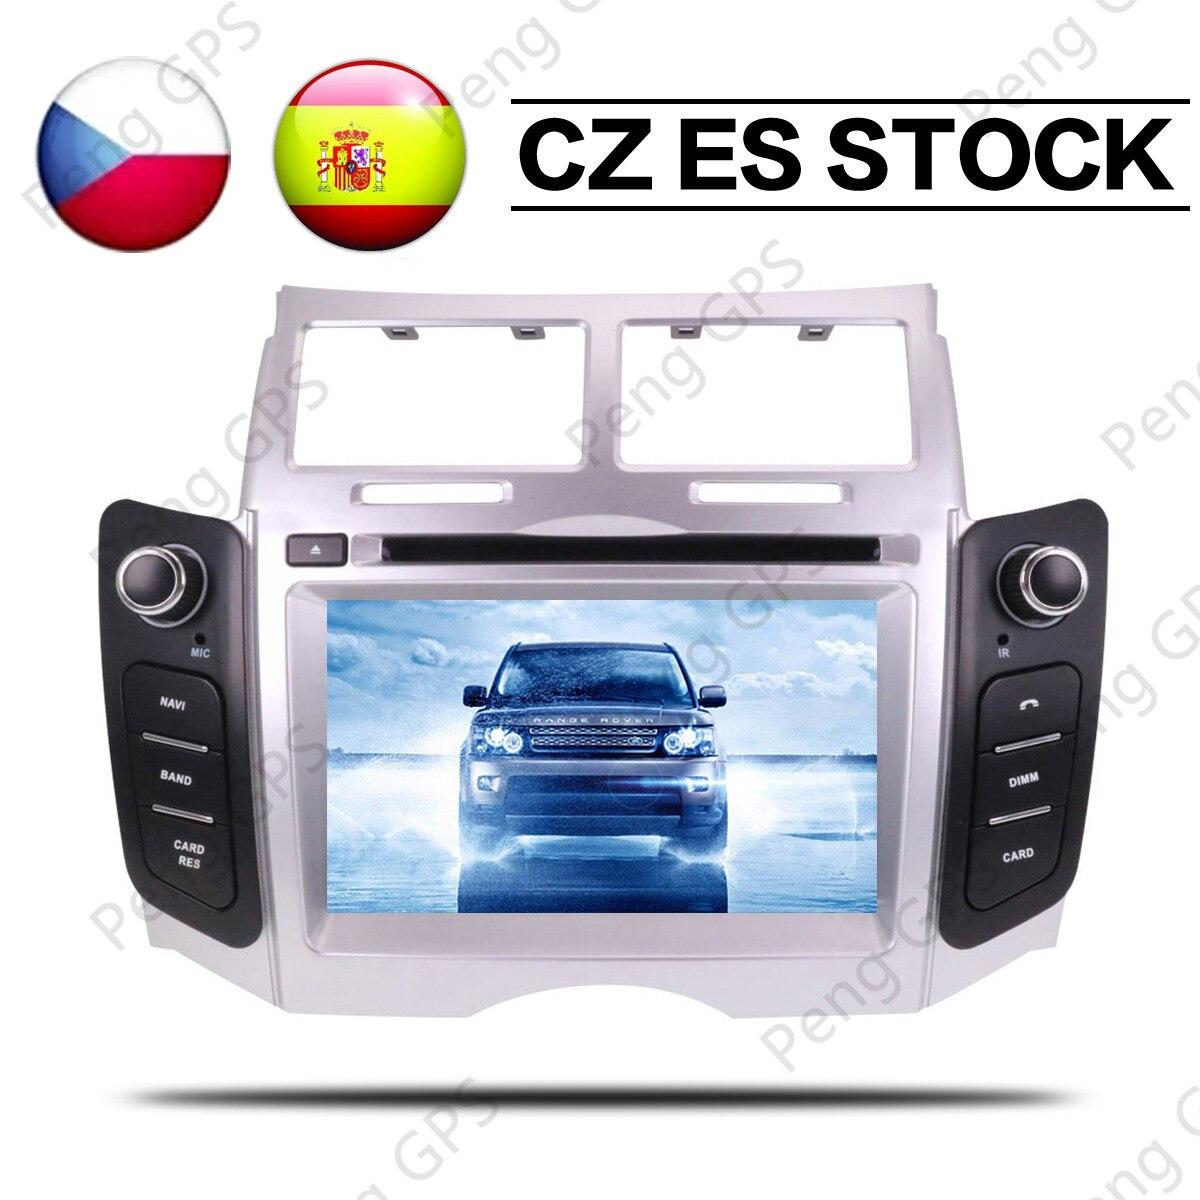 hete korting android 9 0 auto dvd stereo multimedia autoradio voor toyota yaris 2005 2007 2011. Black Bedroom Furniture Sets. Home Design Ideas